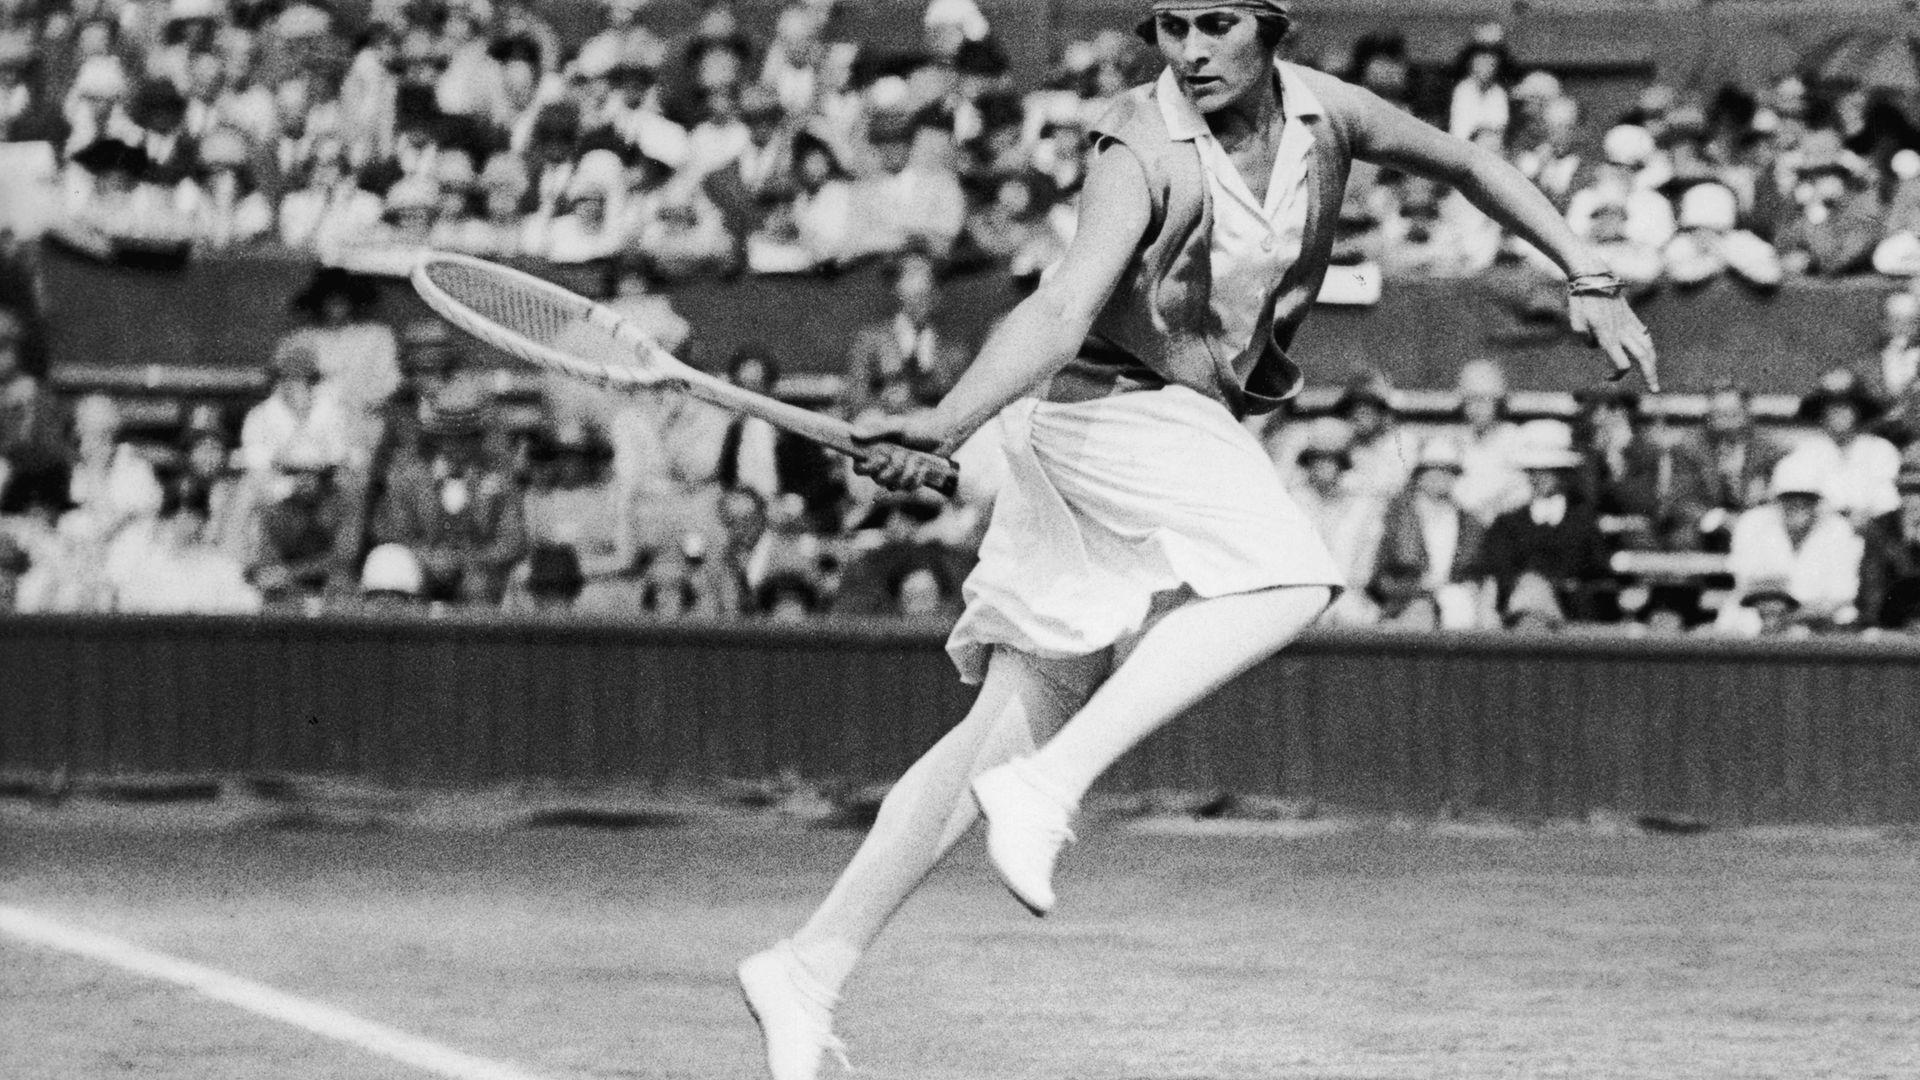 Lili Alvarez at the 1926 Wimbledon championships, 1926 - Credit: Getty Images